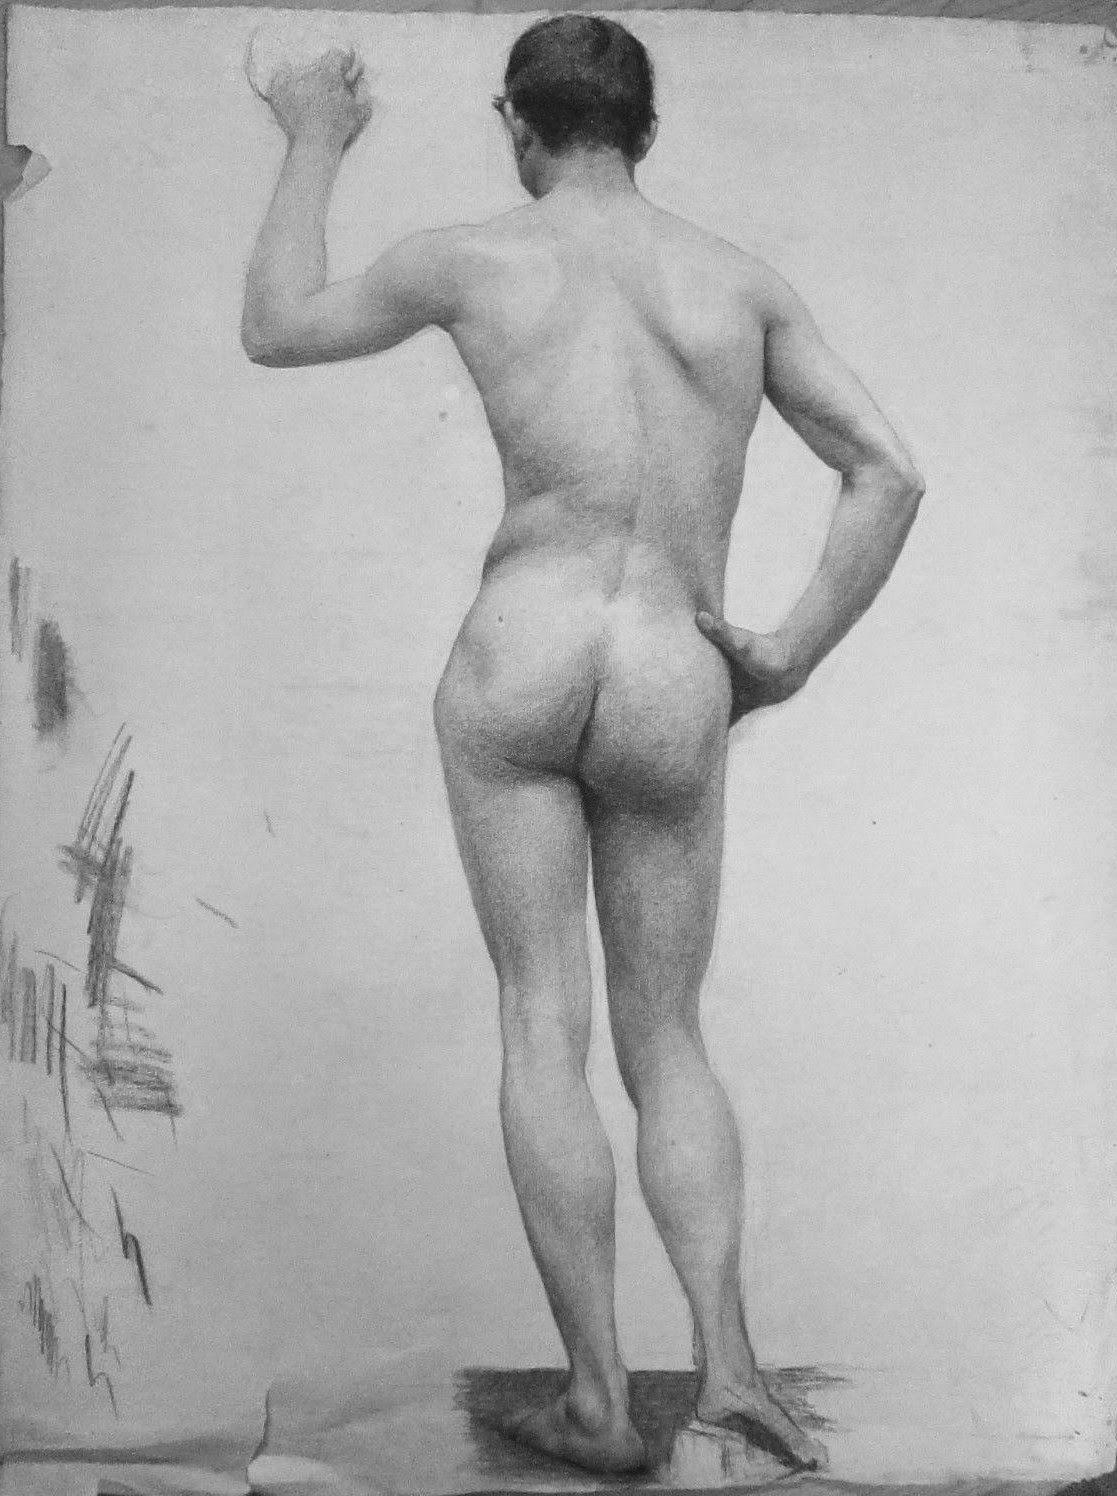 Naked drawings of people